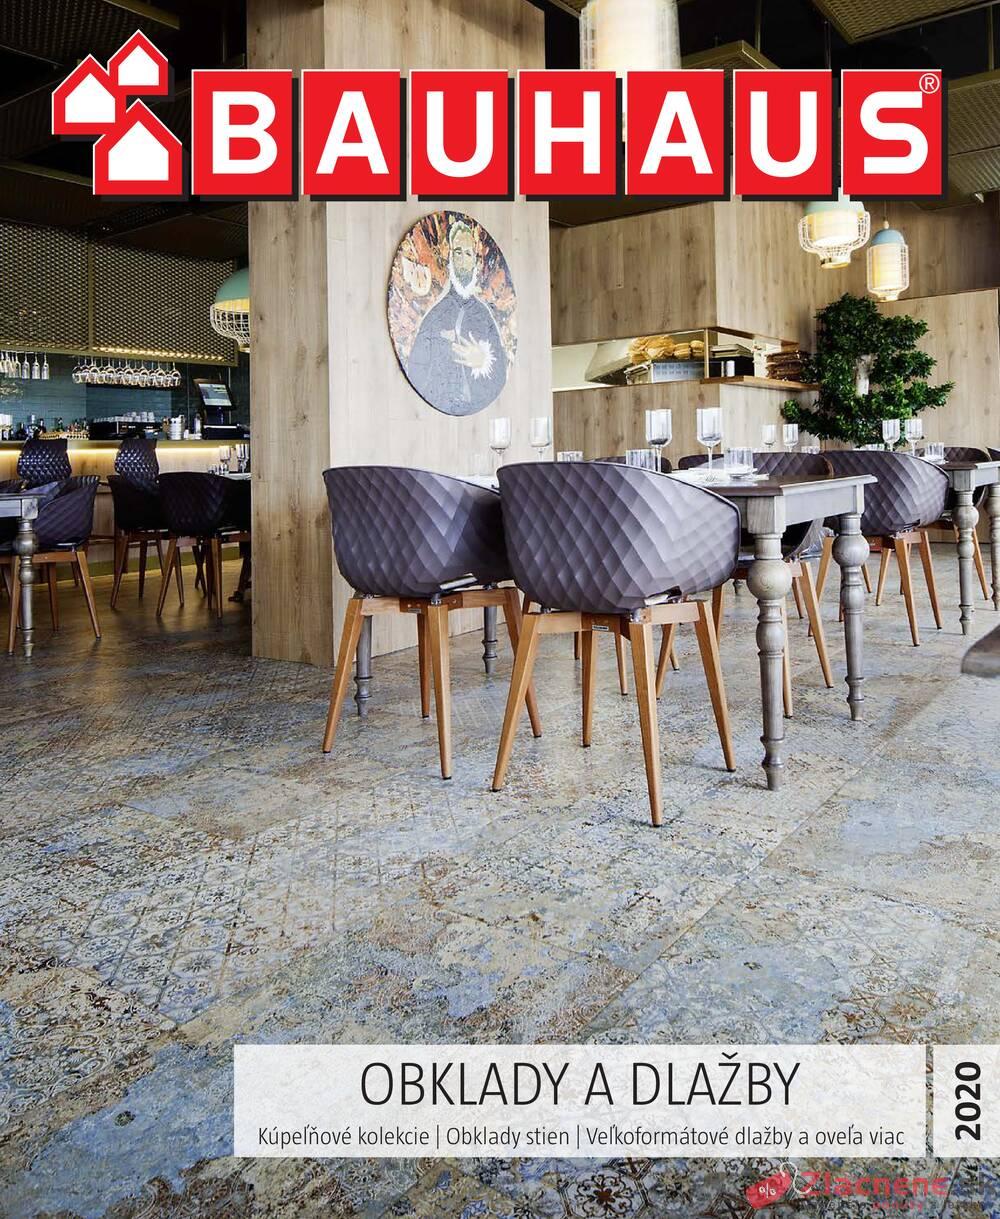 Leták Bauhaus - Bauhaus Obklady a dlažby 3.2. - 30.6. - strana 1